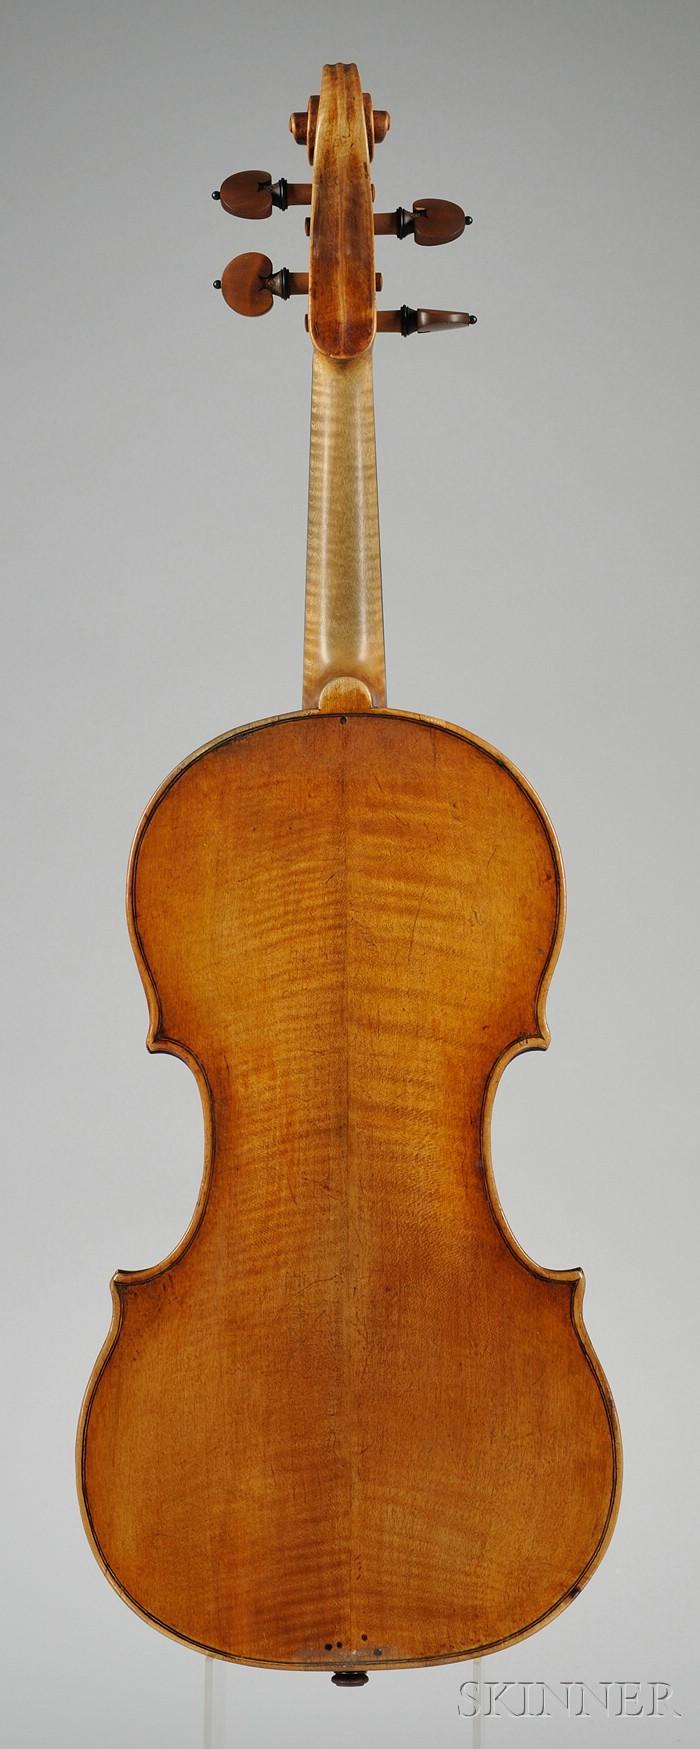 Italian Violin, Giovanni Grancino, Milan, c. 1690